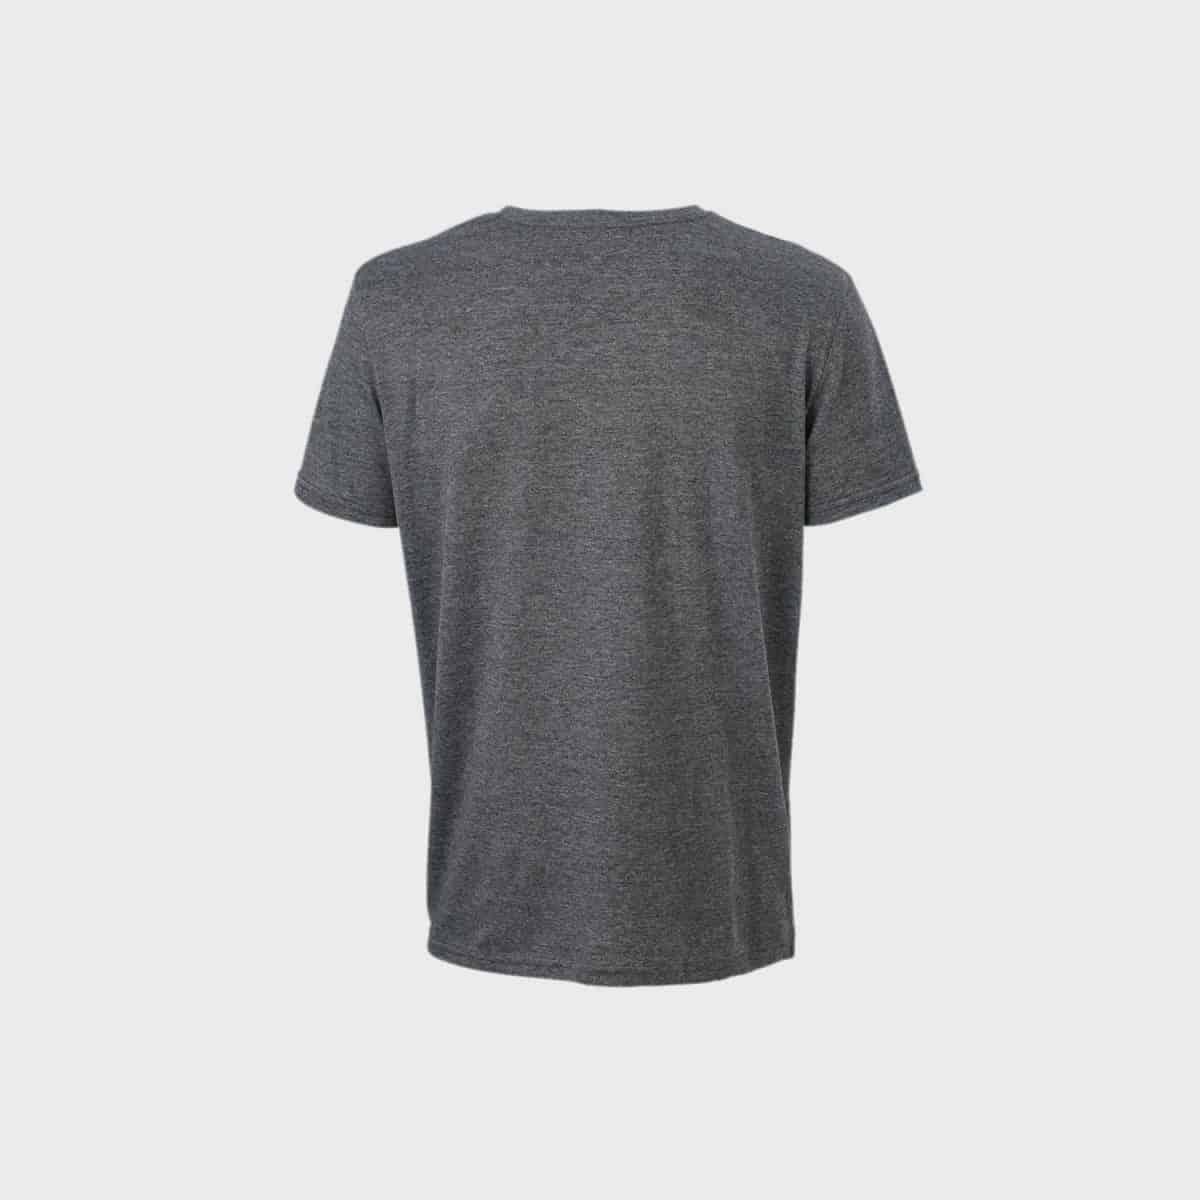 Daiber T Shirts JN974 Blackmelange Back